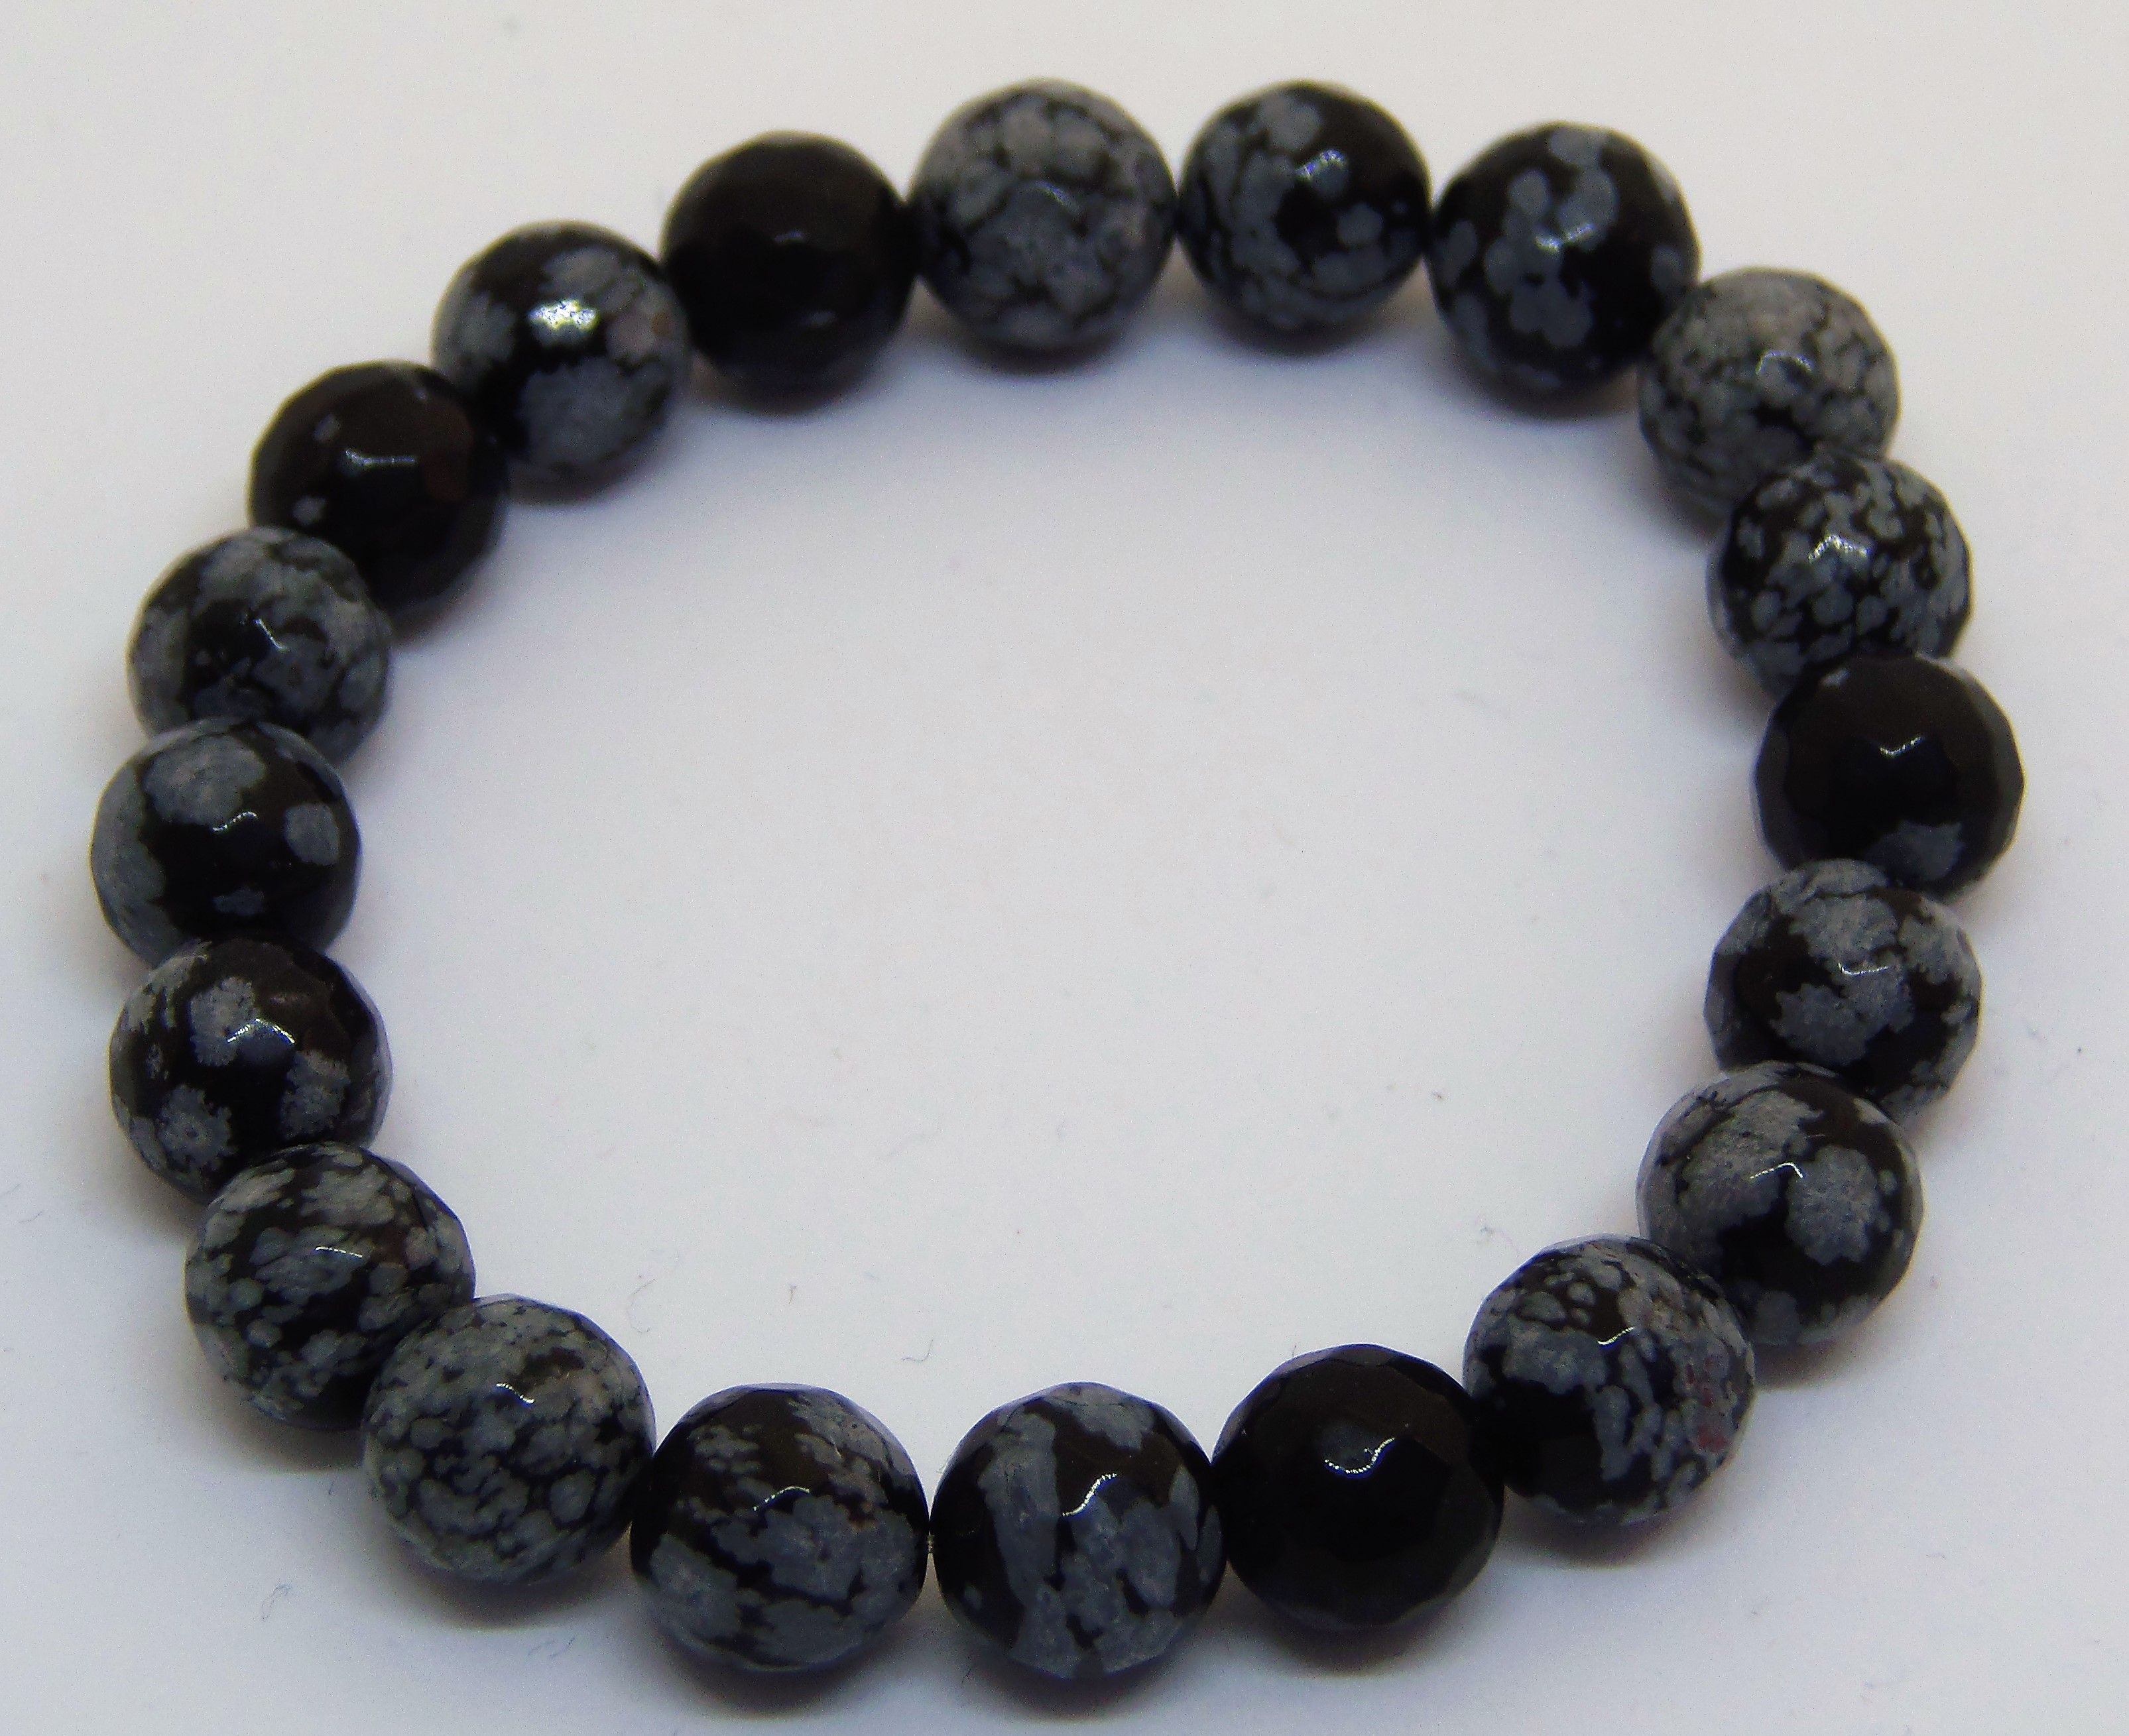 snowflake obsidian stretchy bracelet